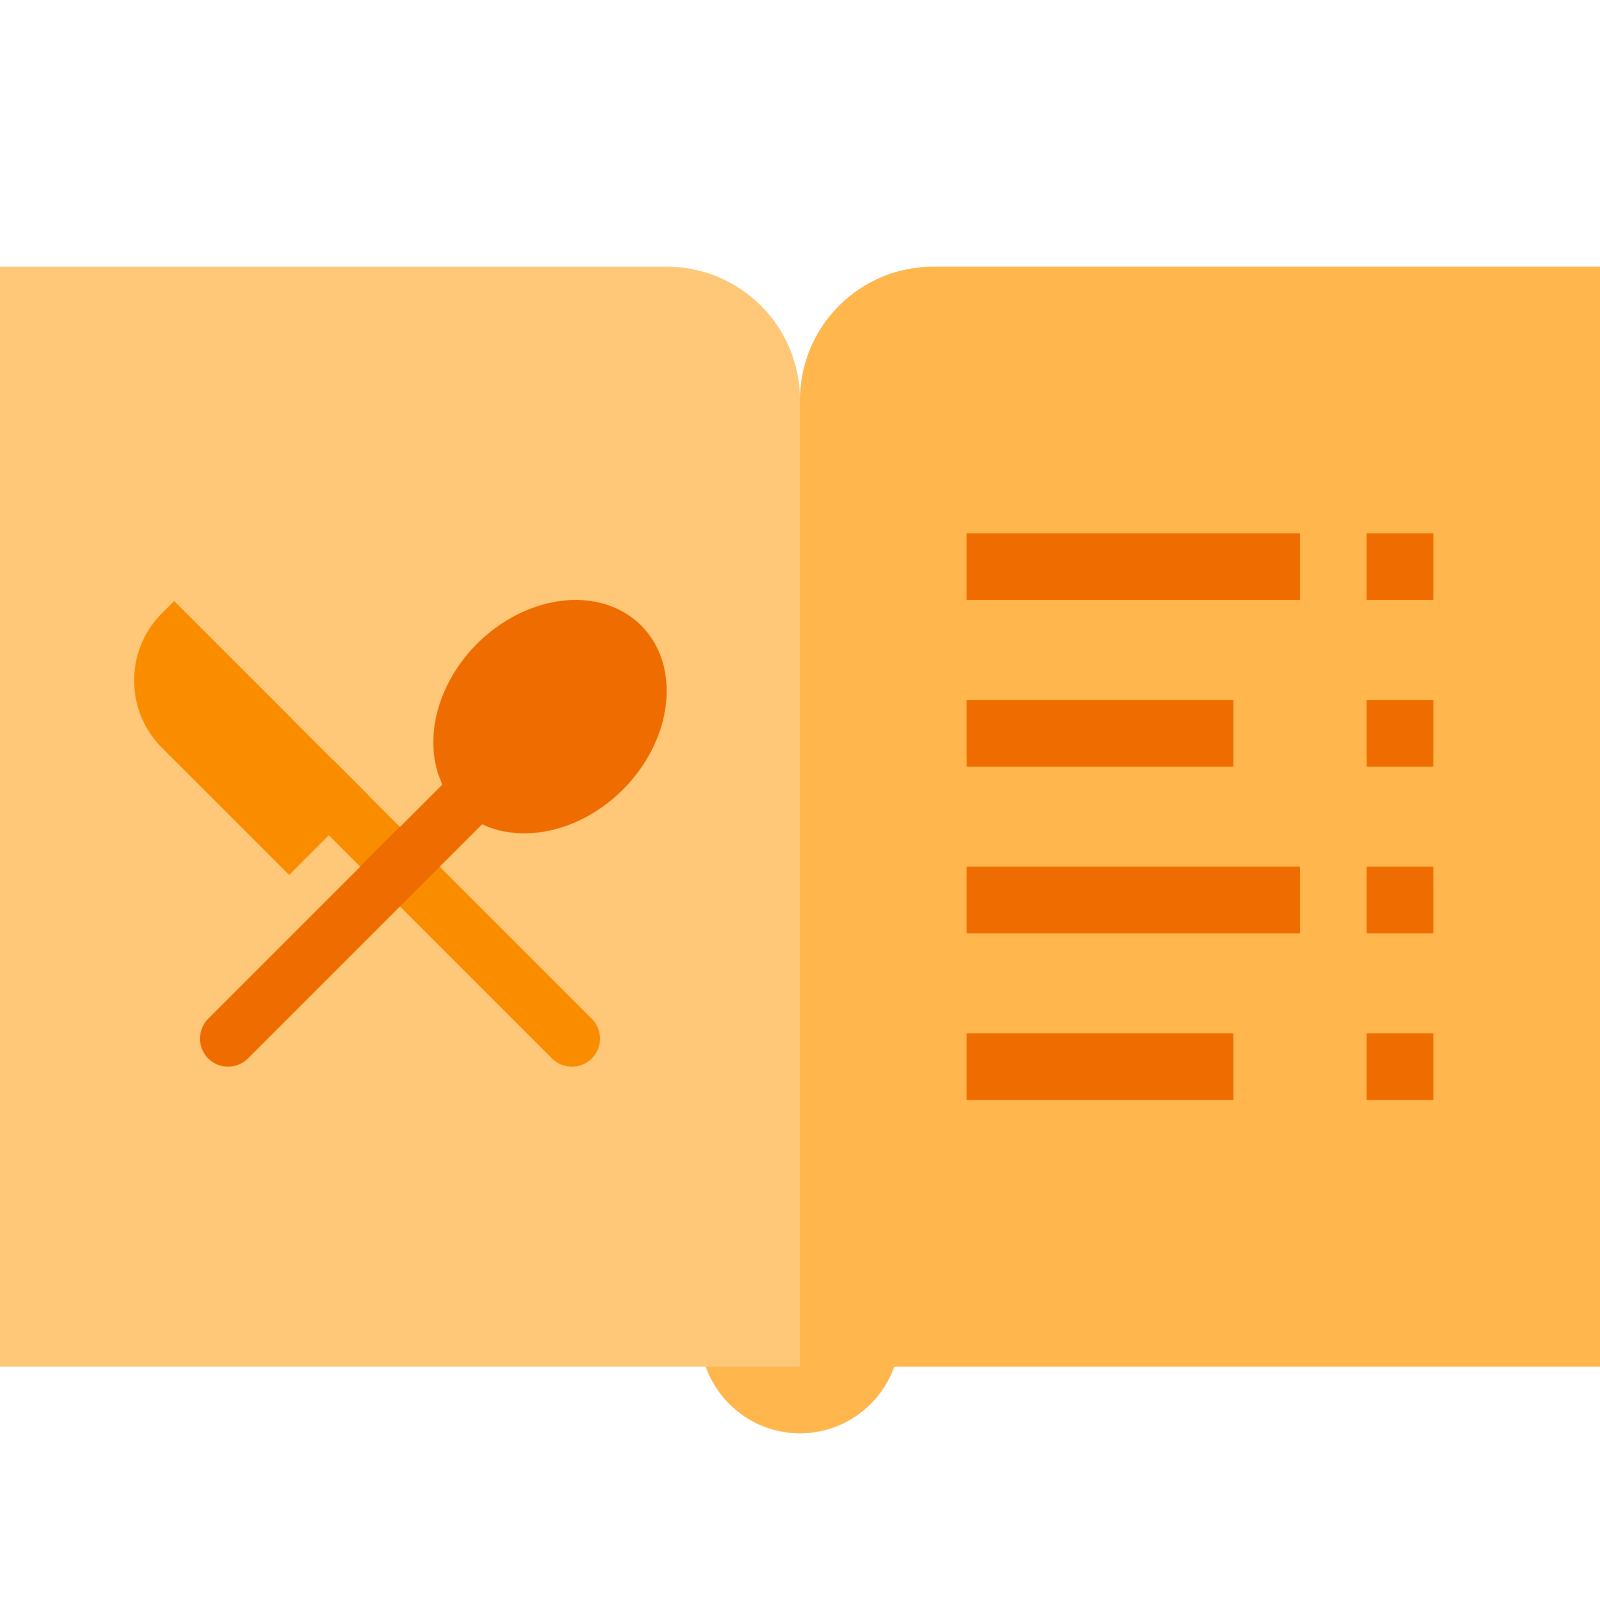 Menu icon free download. Clipart restaurant restaurant building